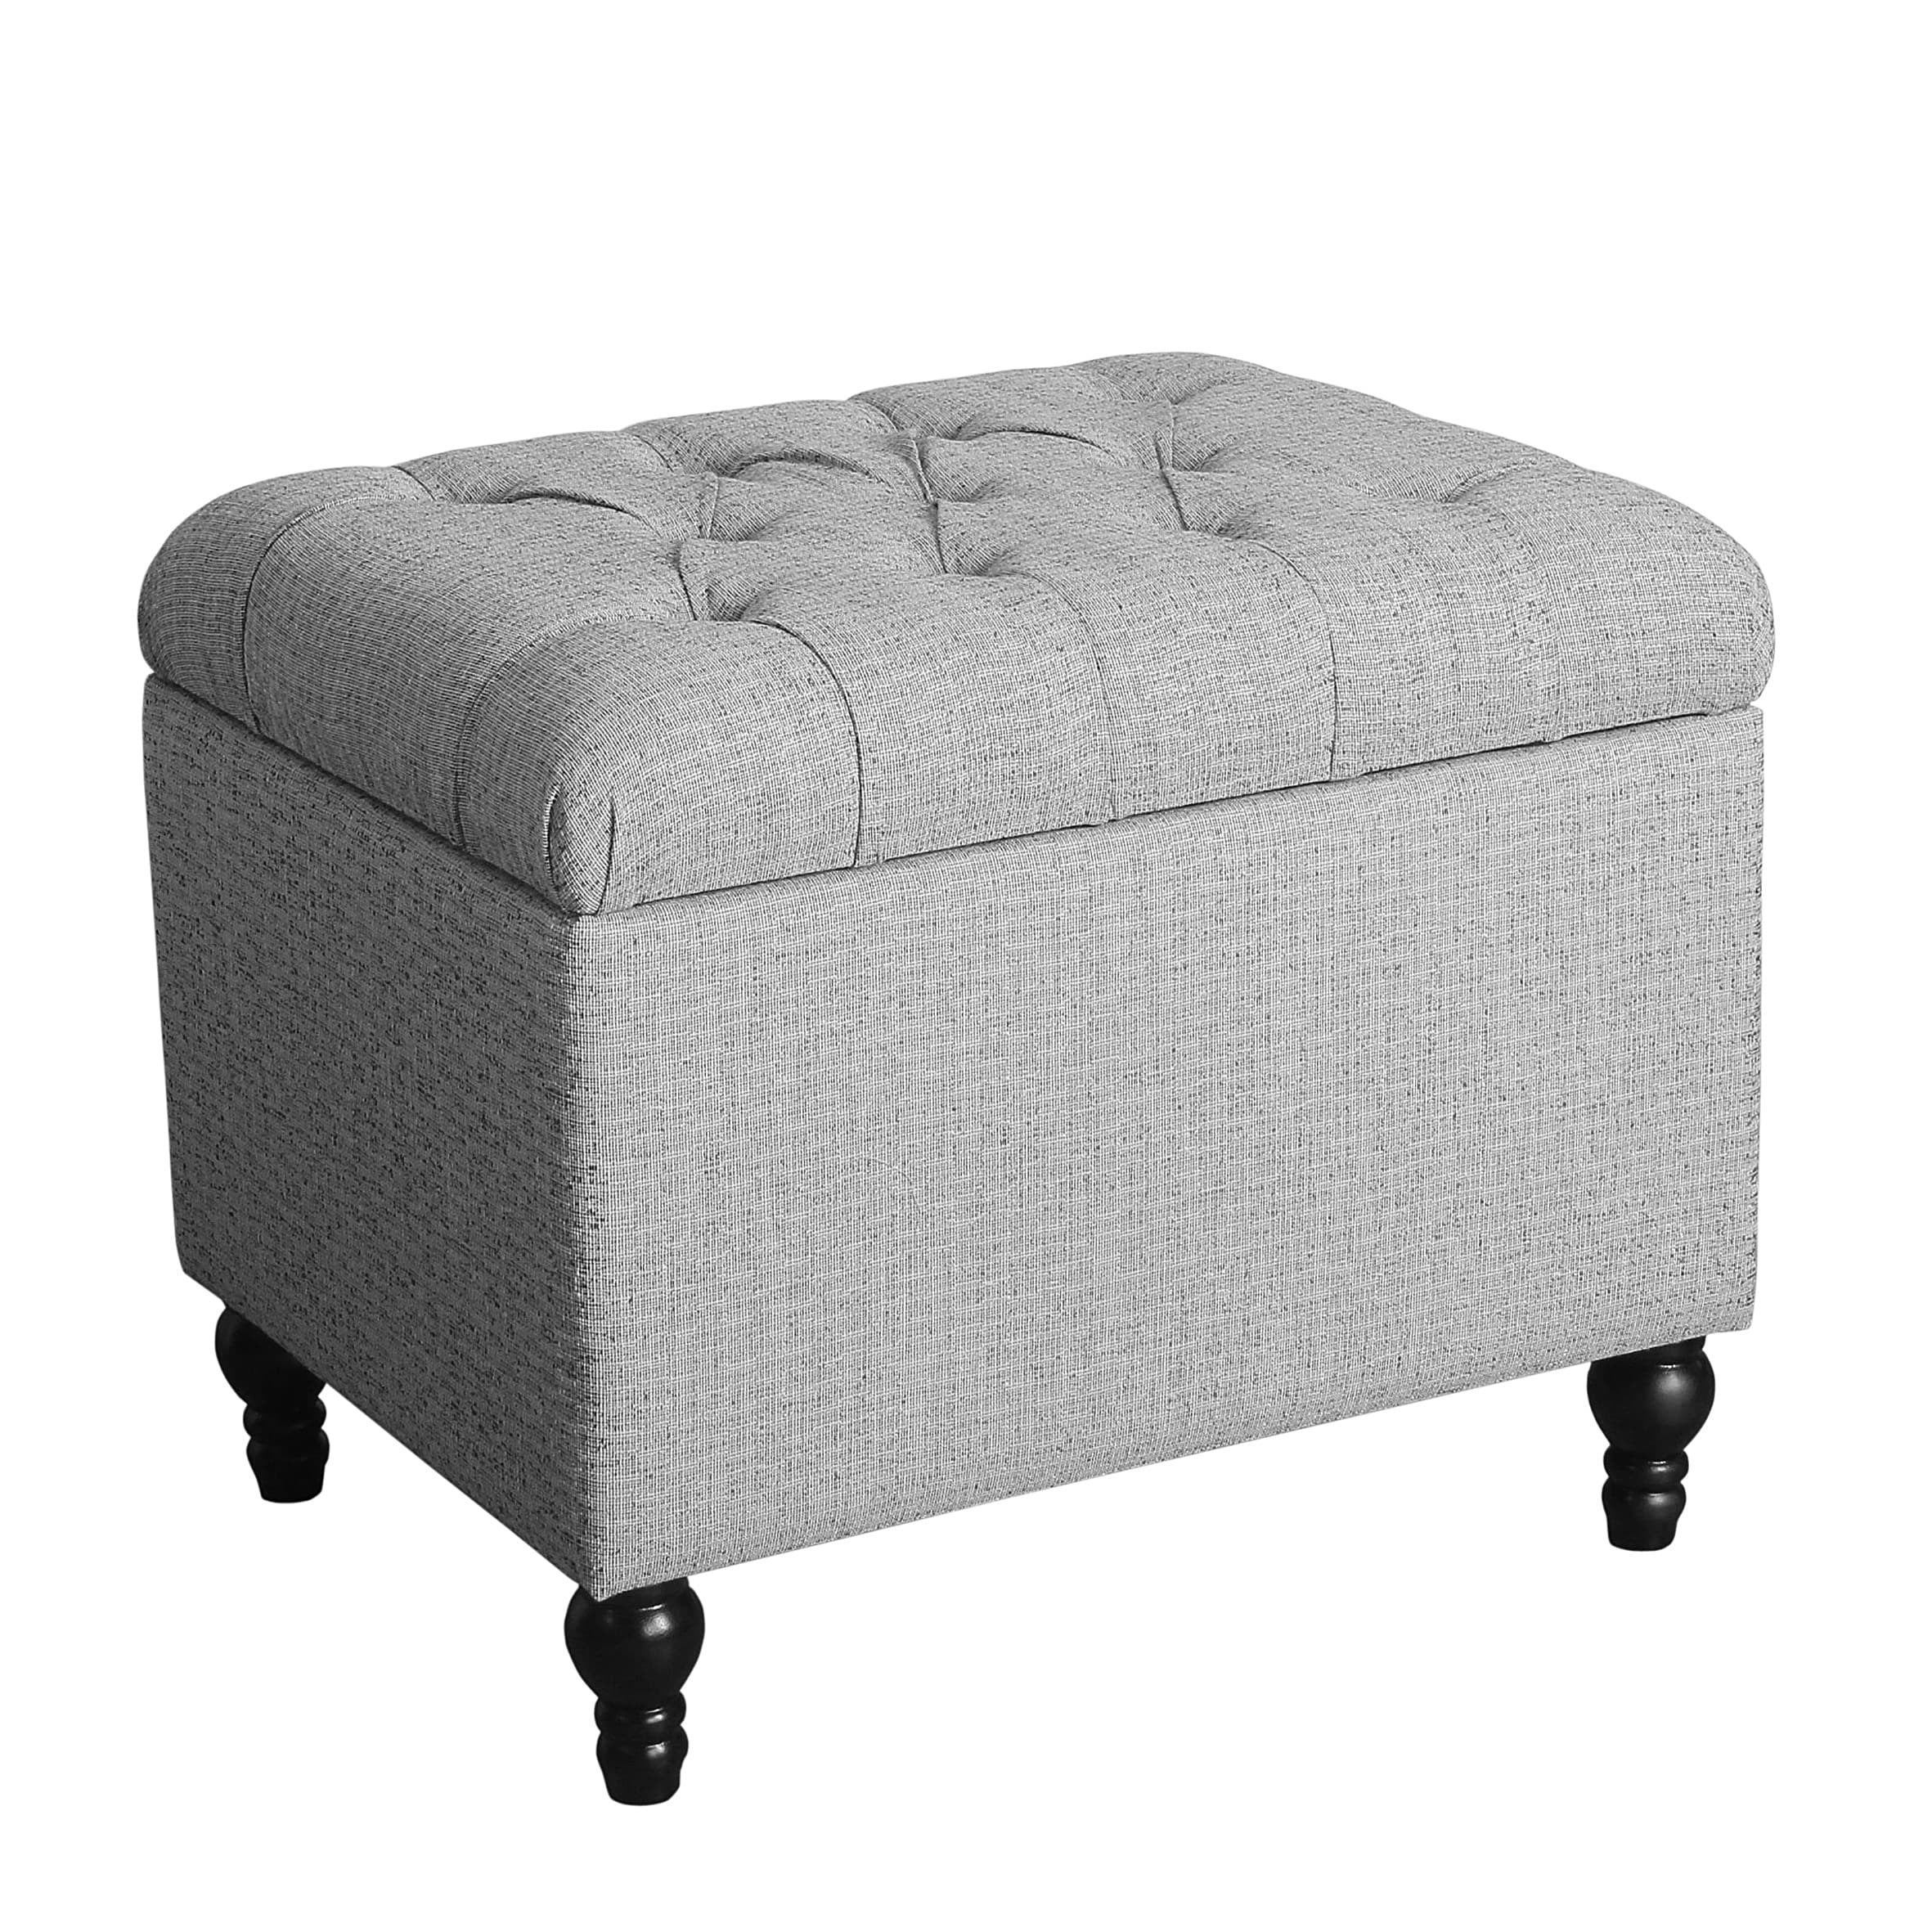 Magnificent Homepop Medium Tufted Storage Ottoman Andrewgaddart Wooden Chair Designs For Living Room Andrewgaddartcom